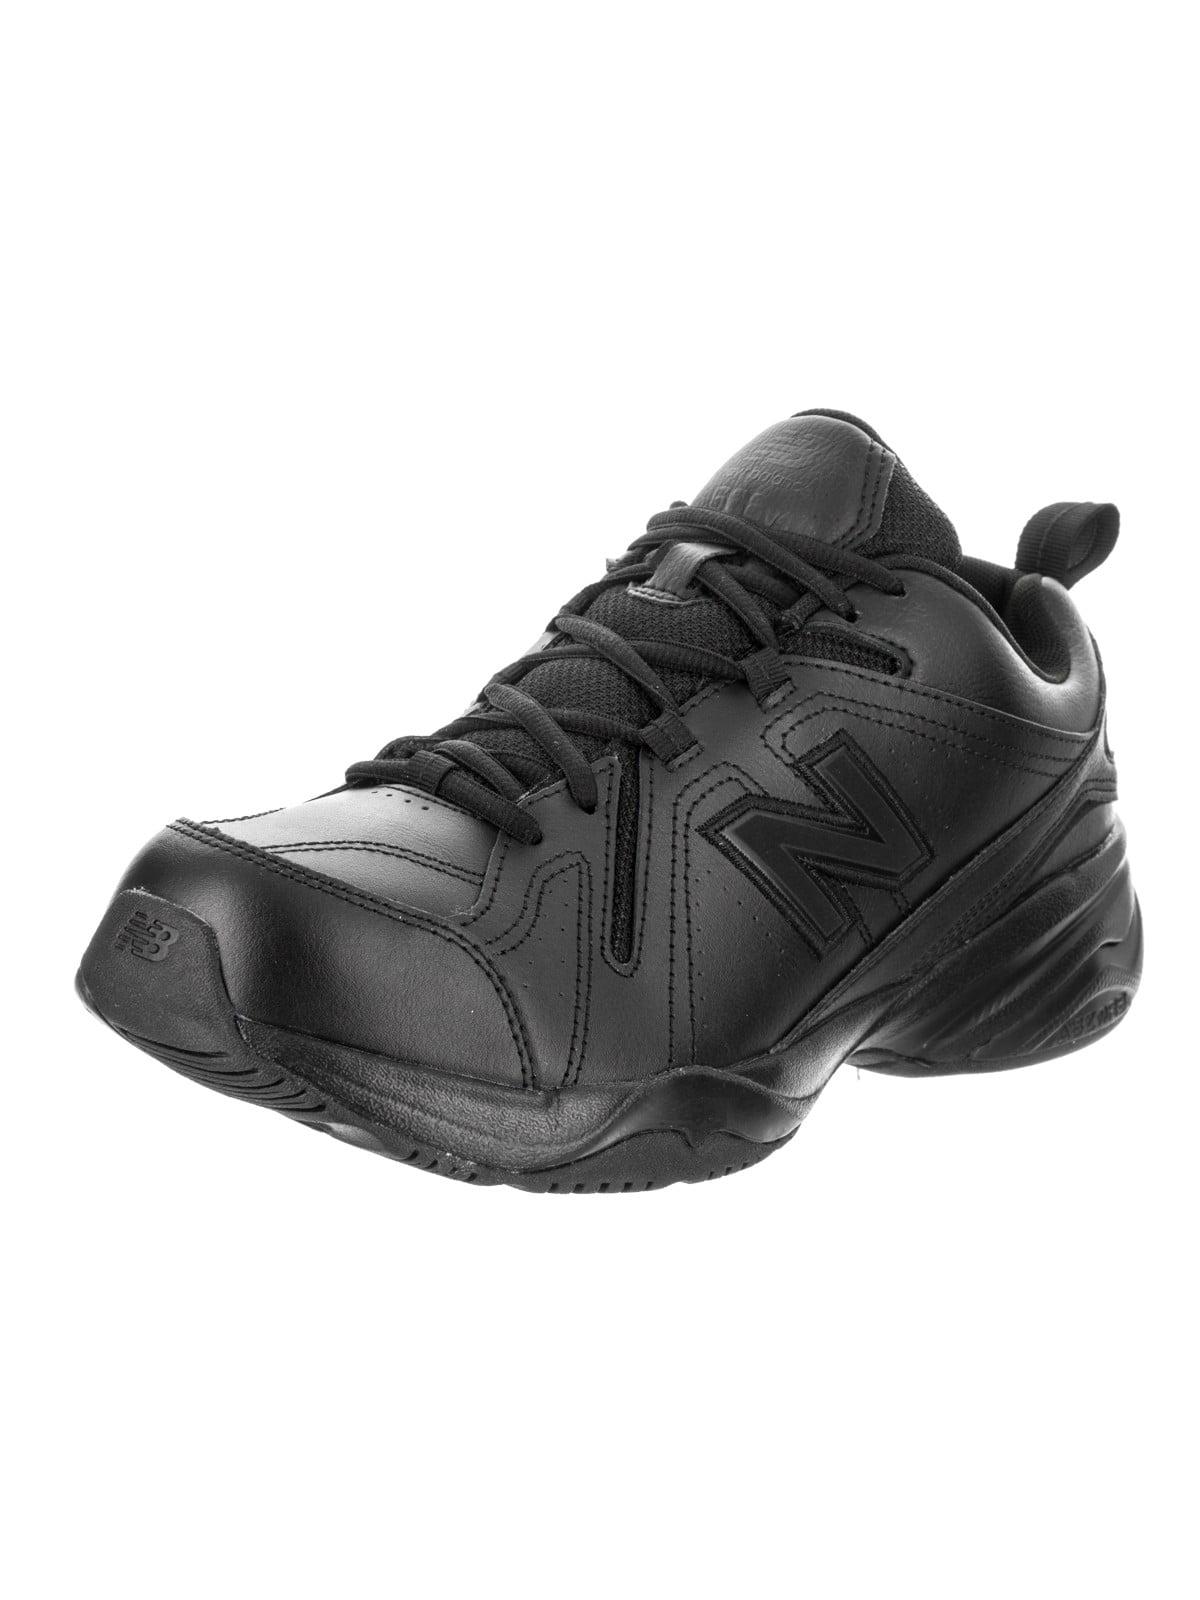 New Balance Men's 608v4 2E Training Shoe by New Balance